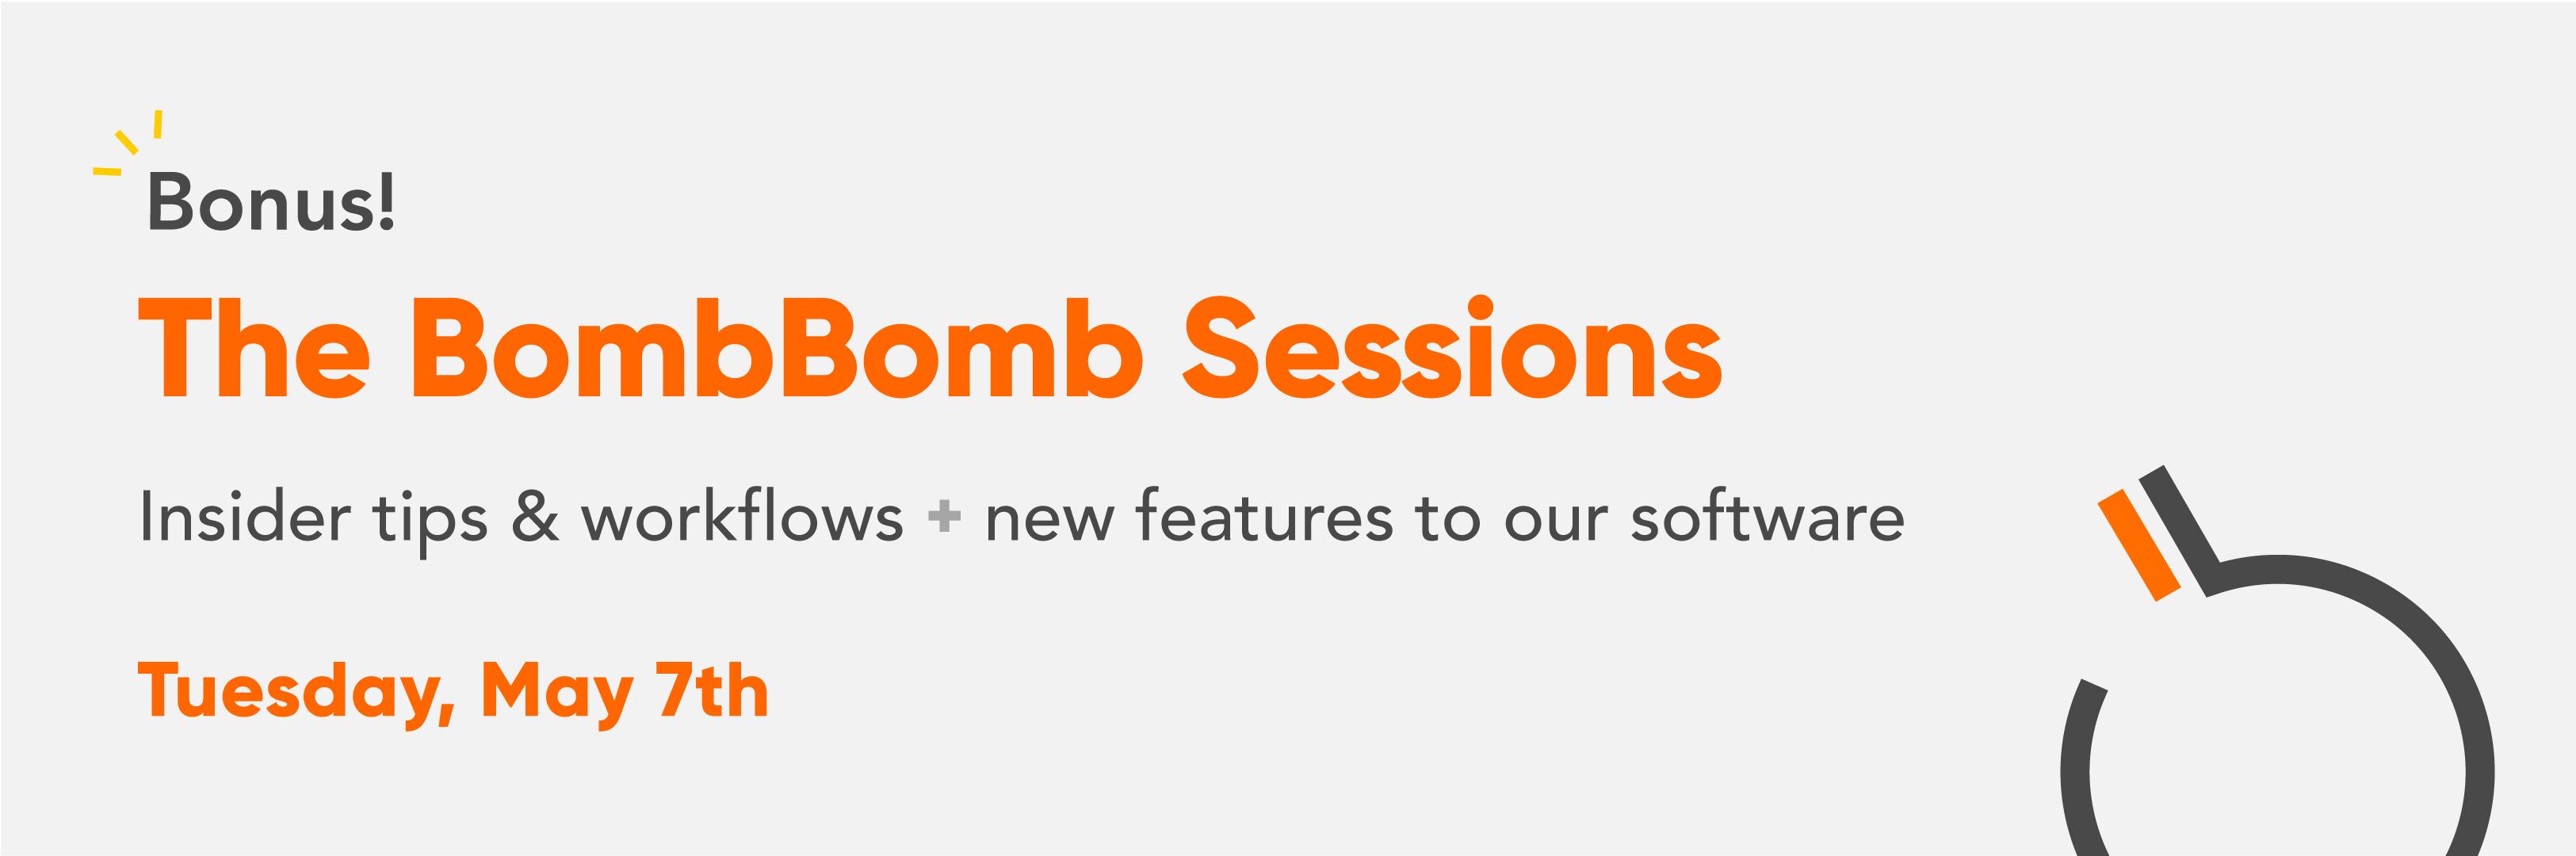 BombBomb Sessions